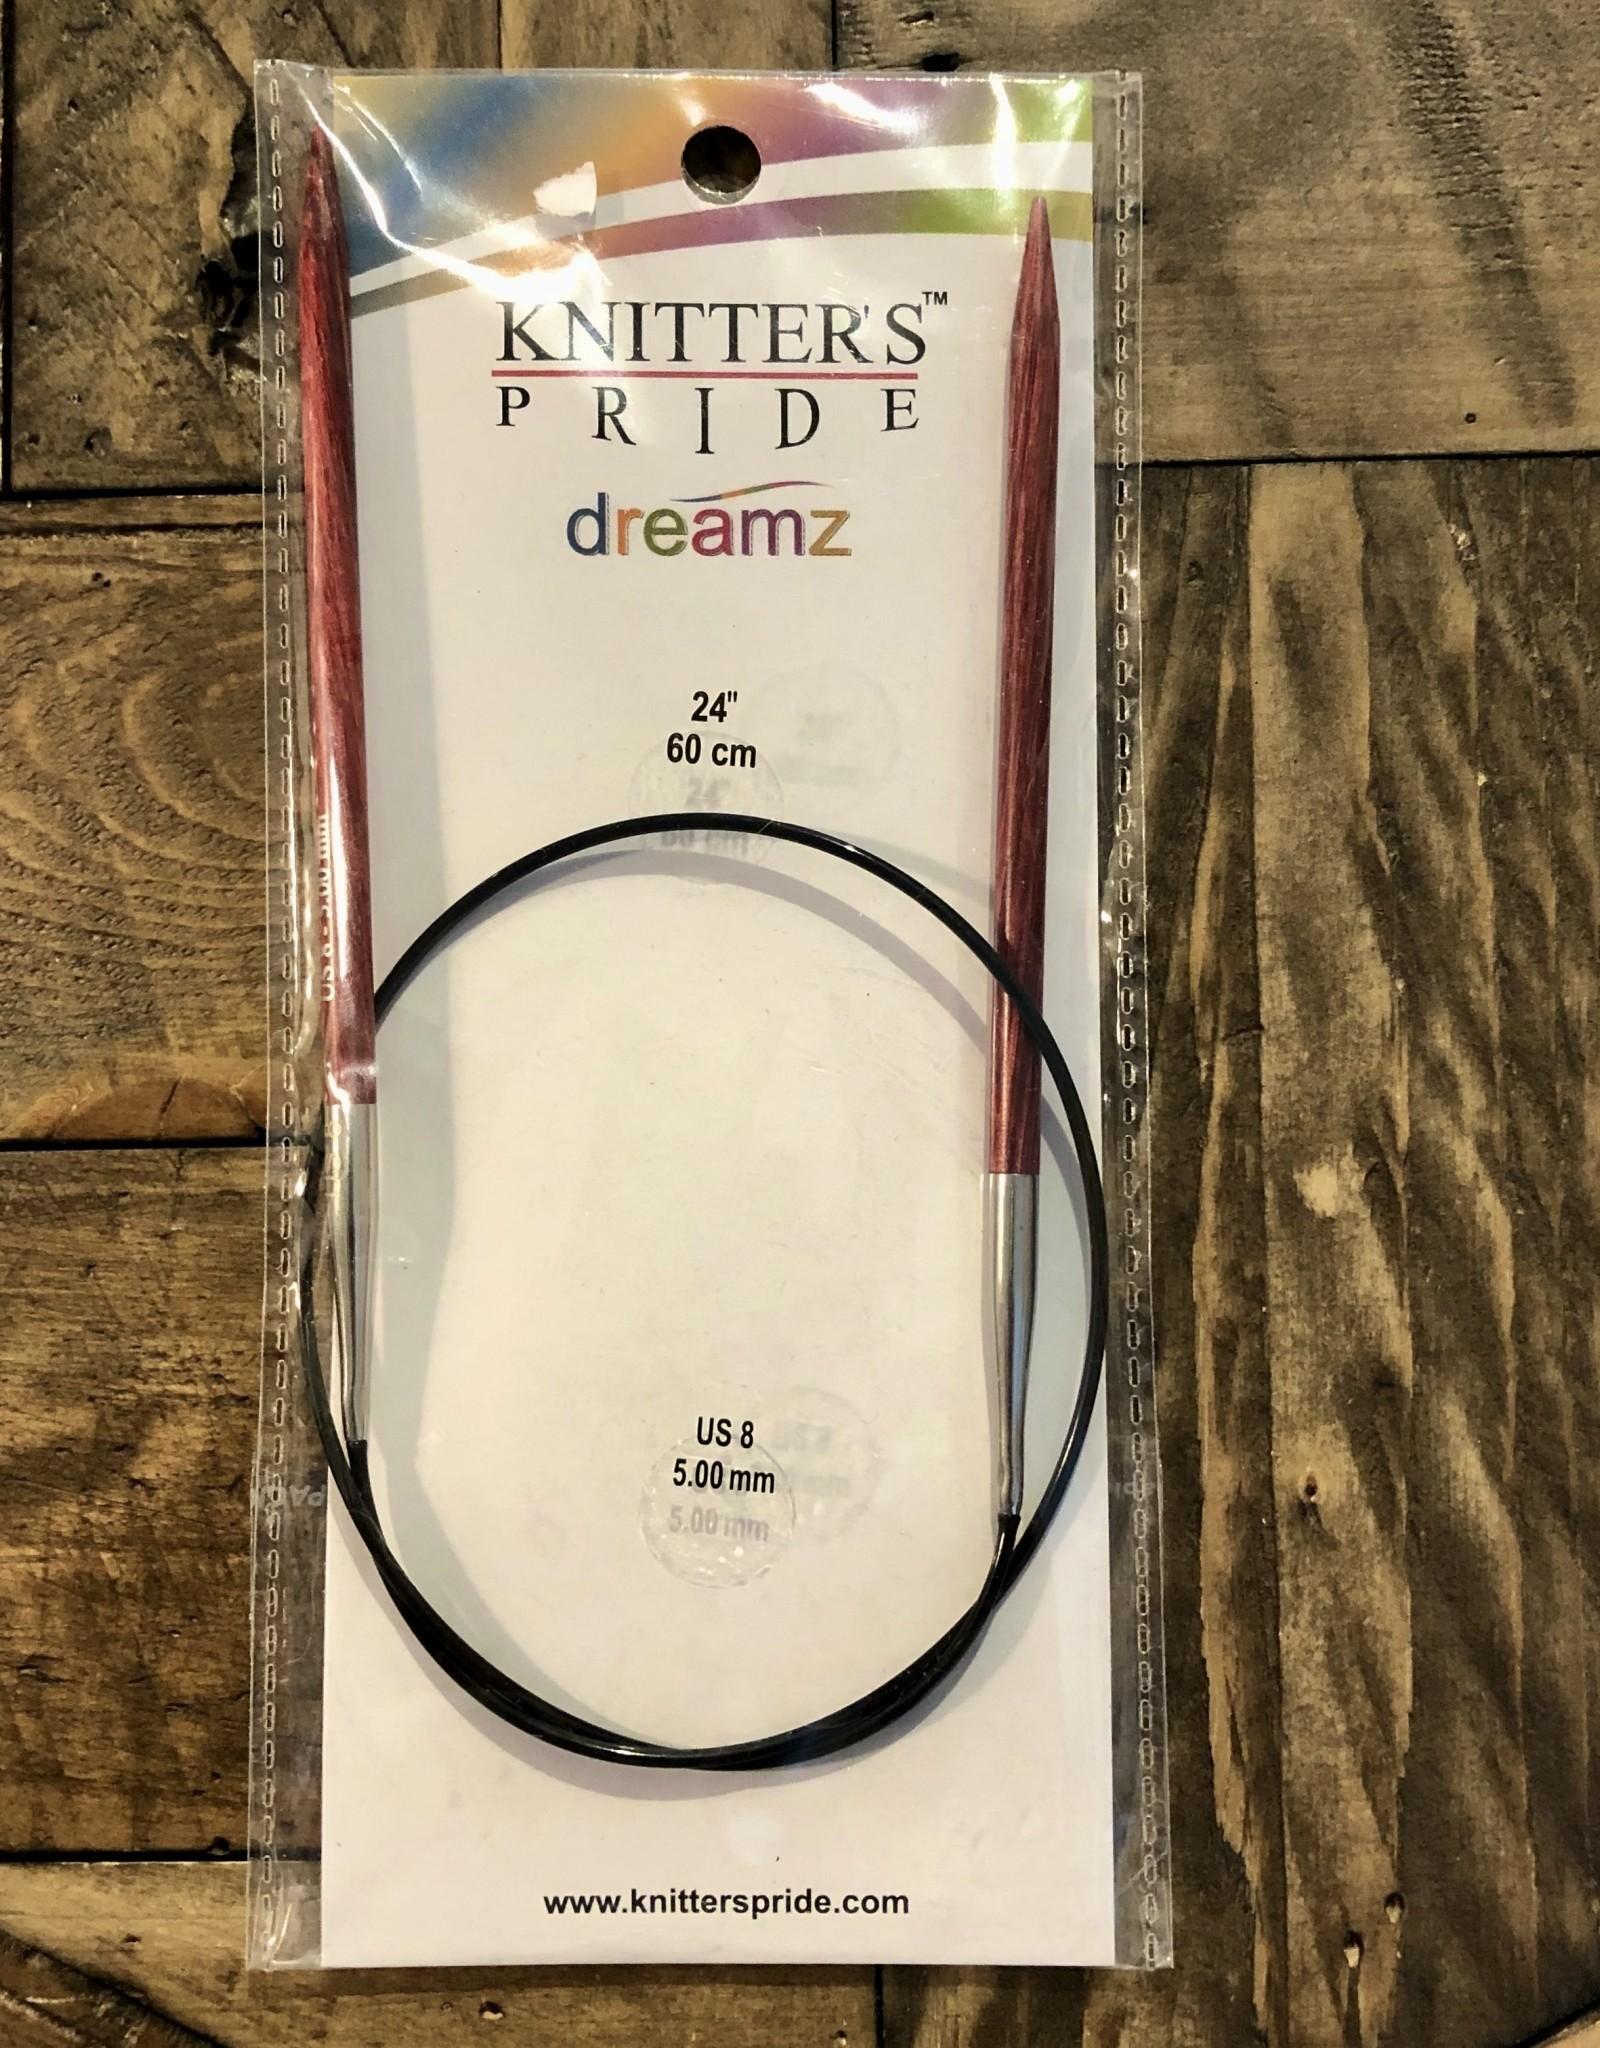 Knitters Pride Knitters Pride Circular Needles - Dreamz